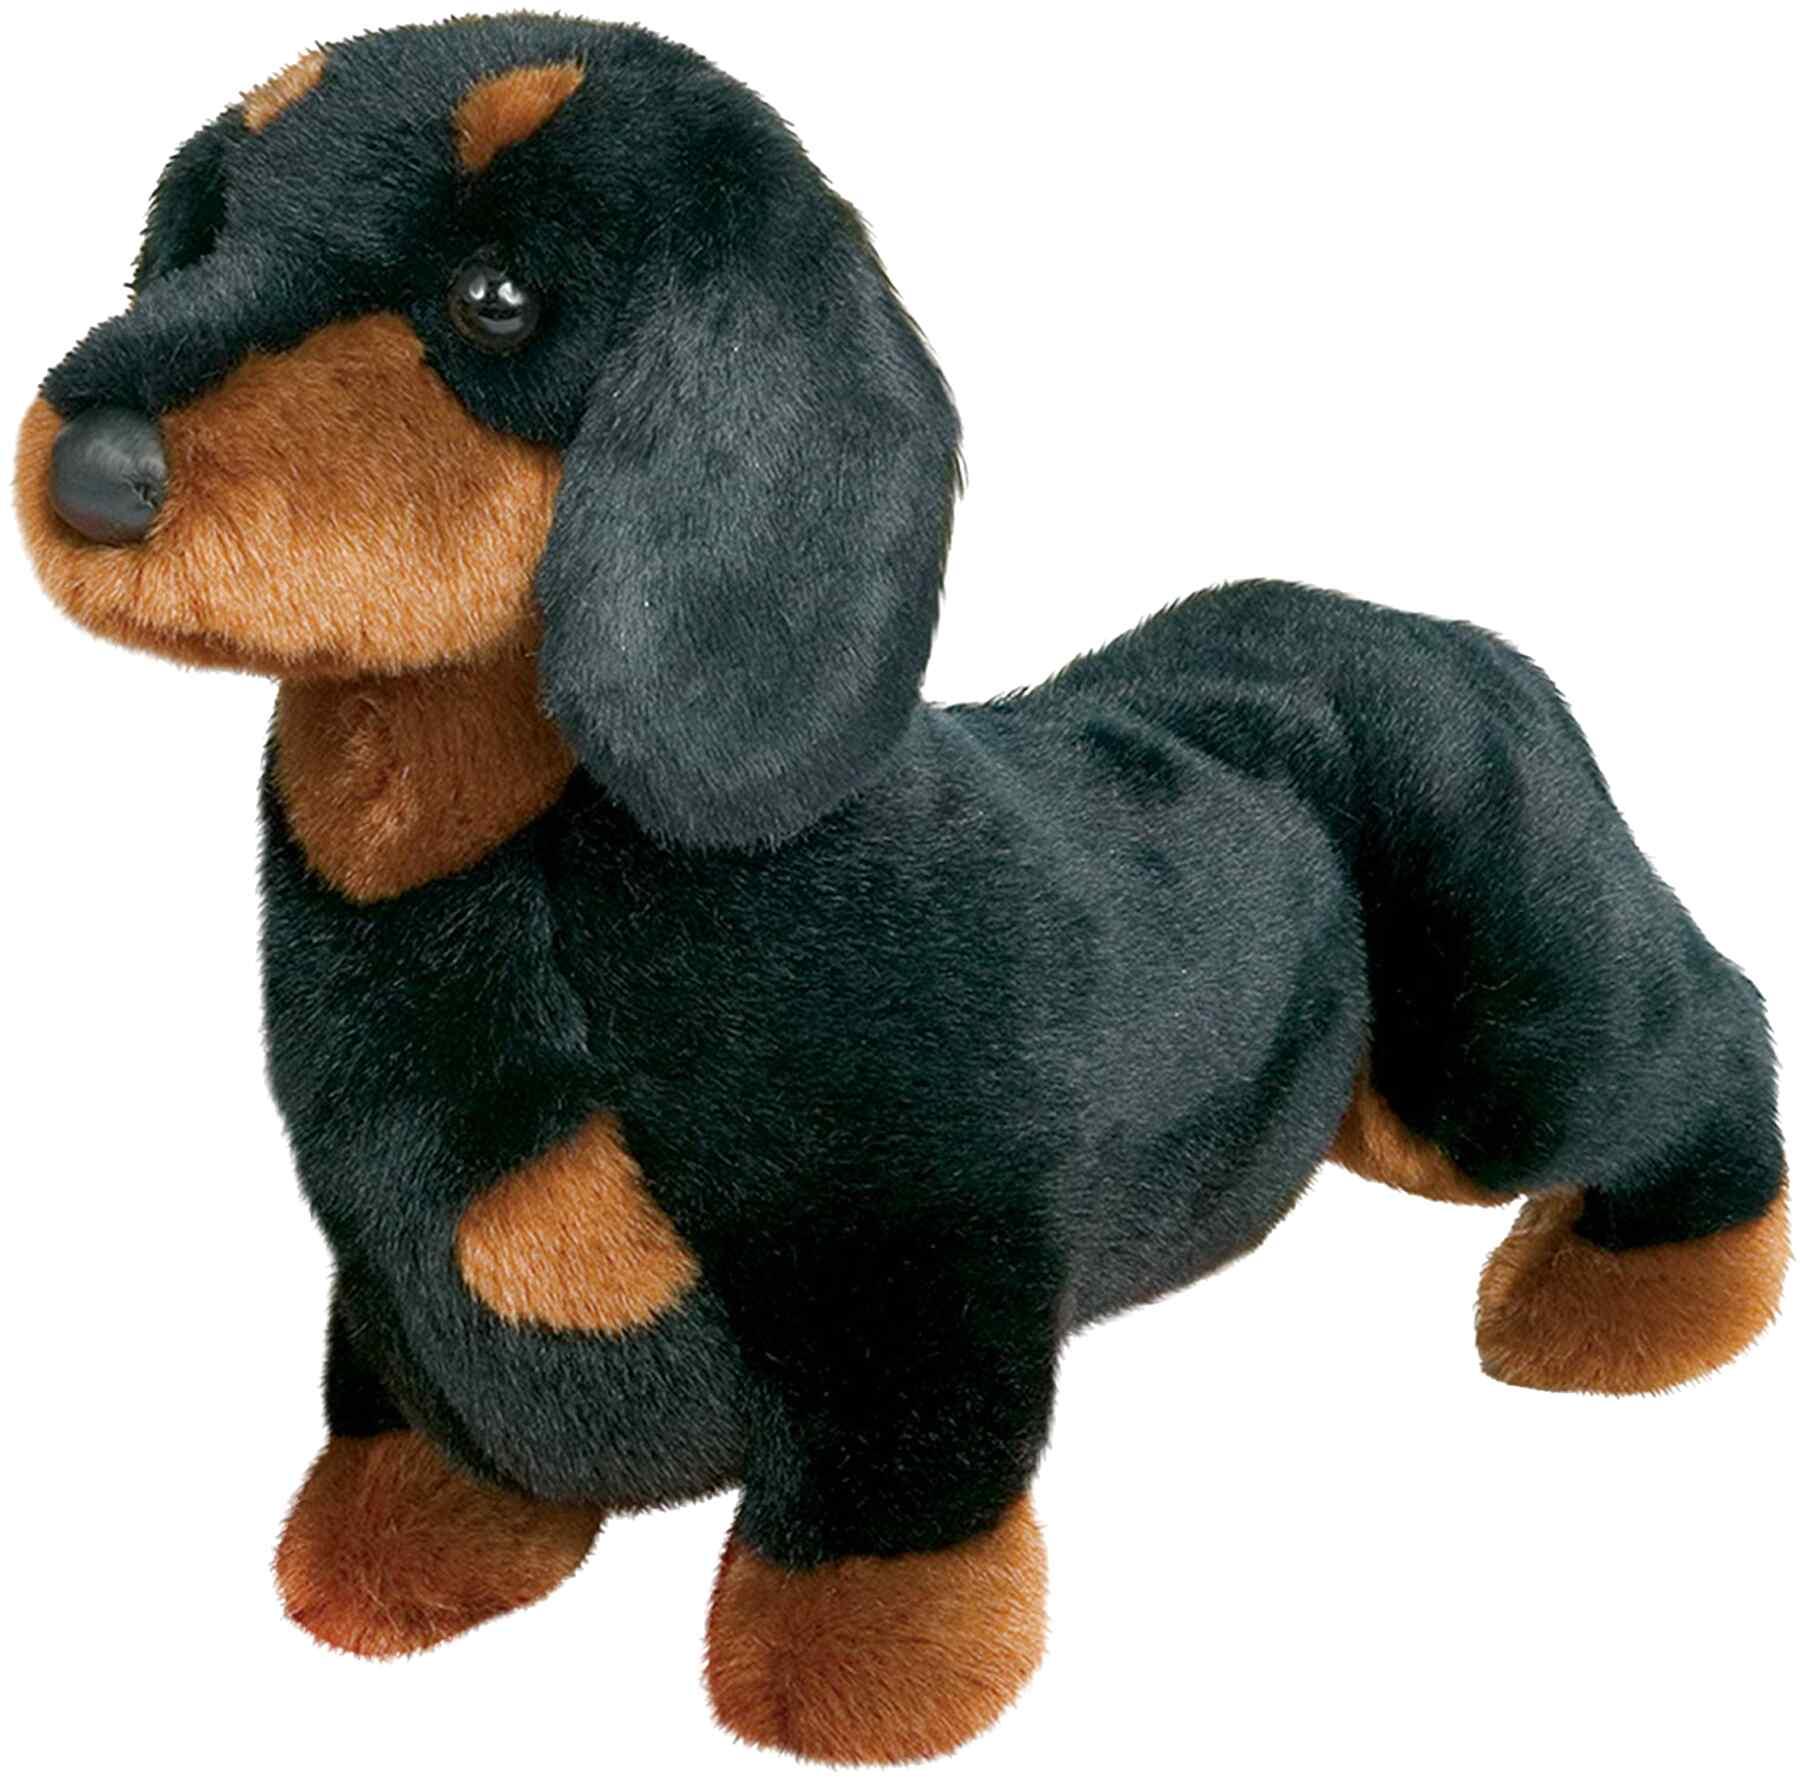 dachshund toy for sale